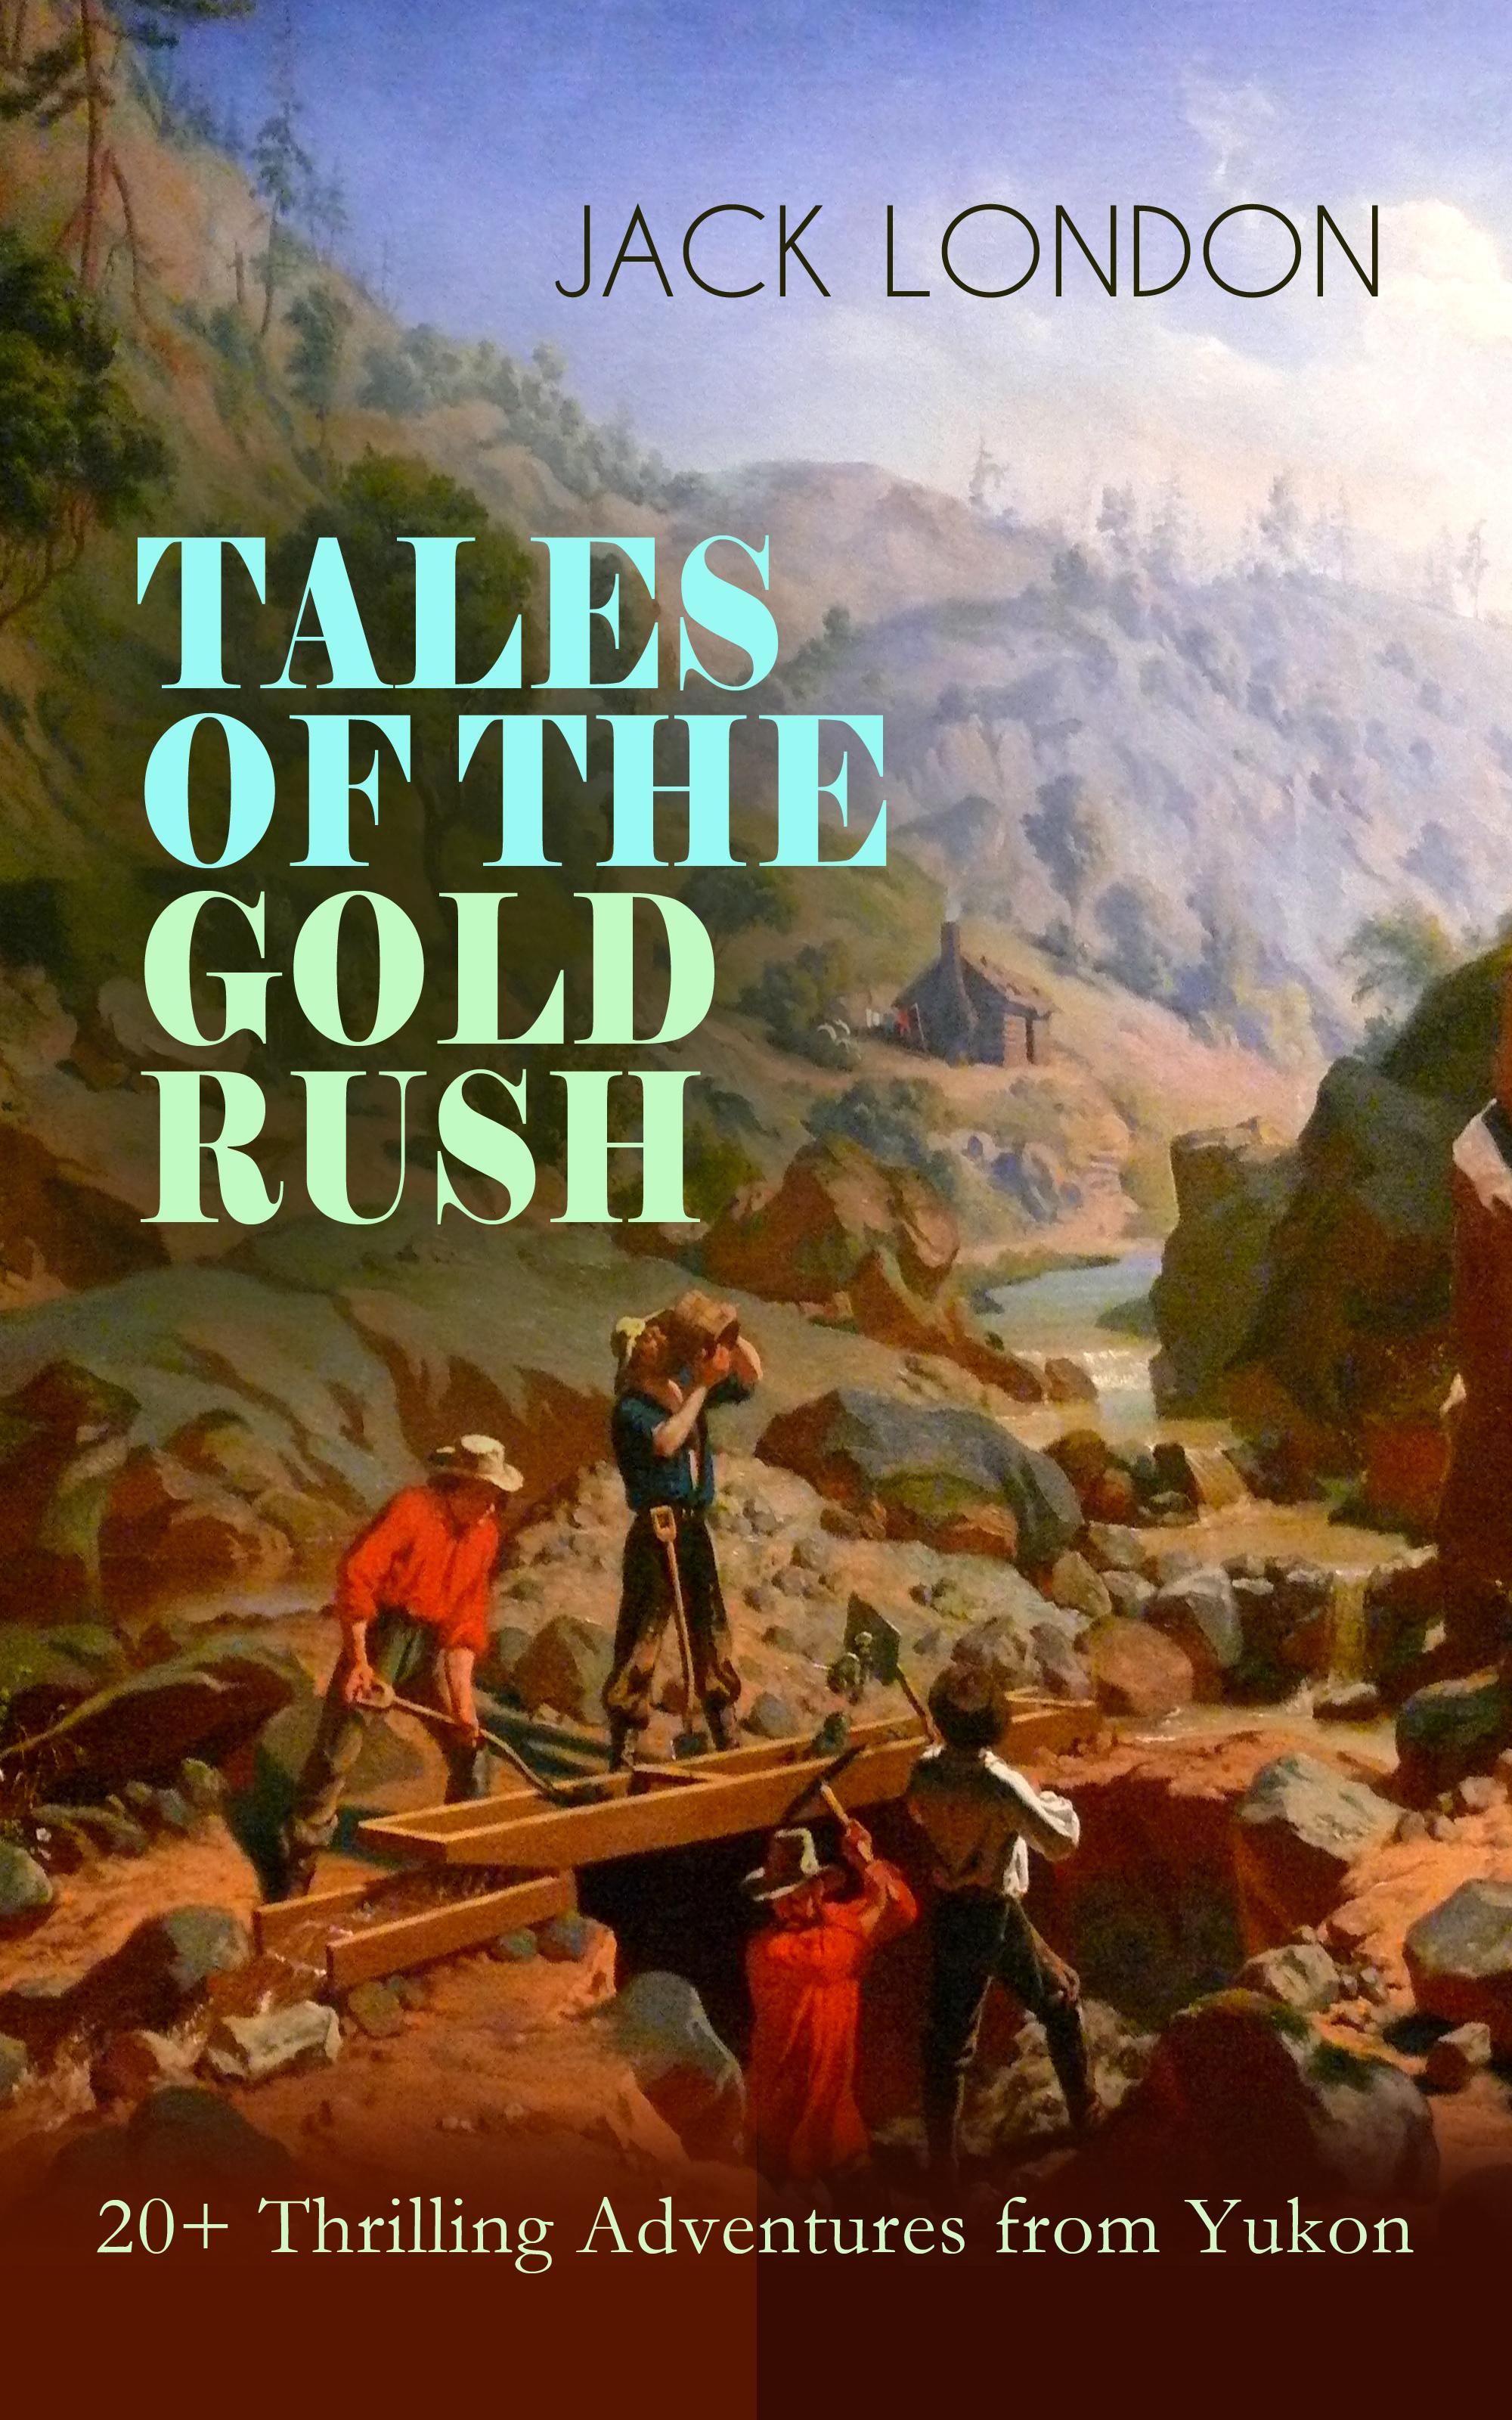 цена на Jack London TALES OF THE GOLD RUSH – 20+ Thrilling Adventures from Yukon